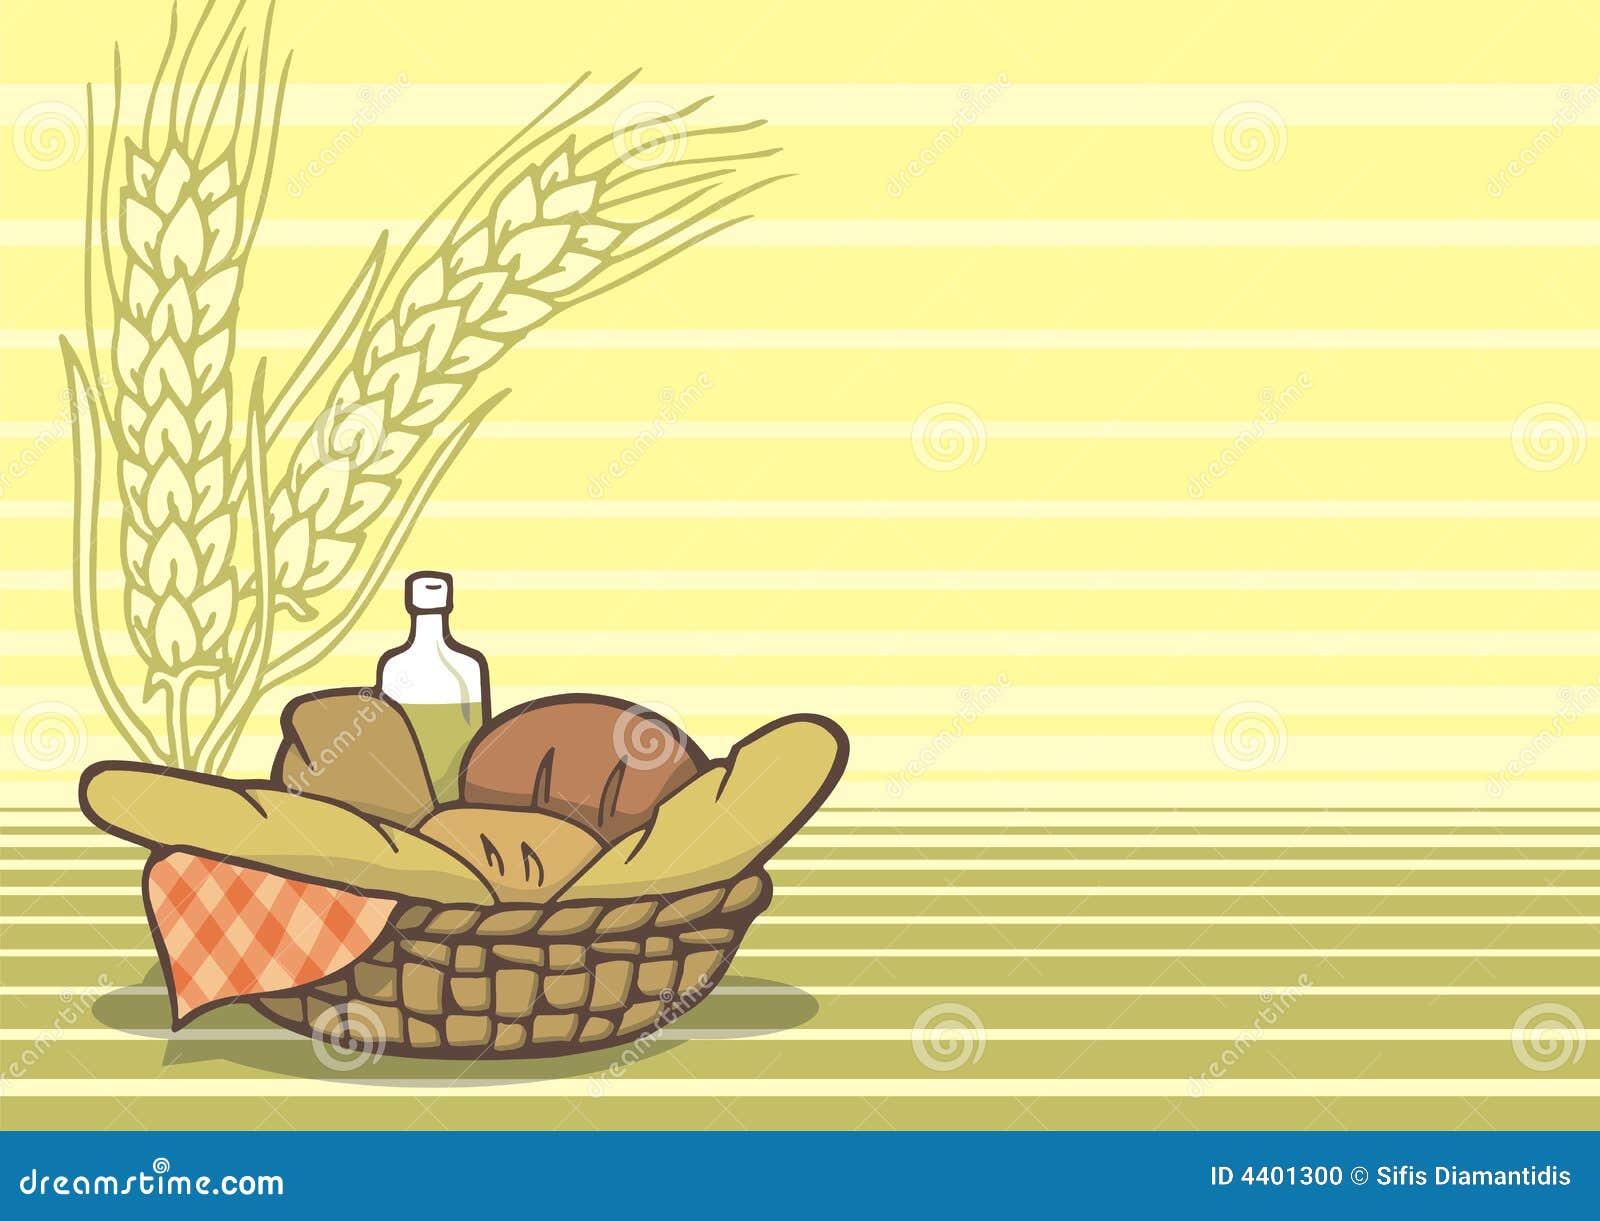 Basket of breads background